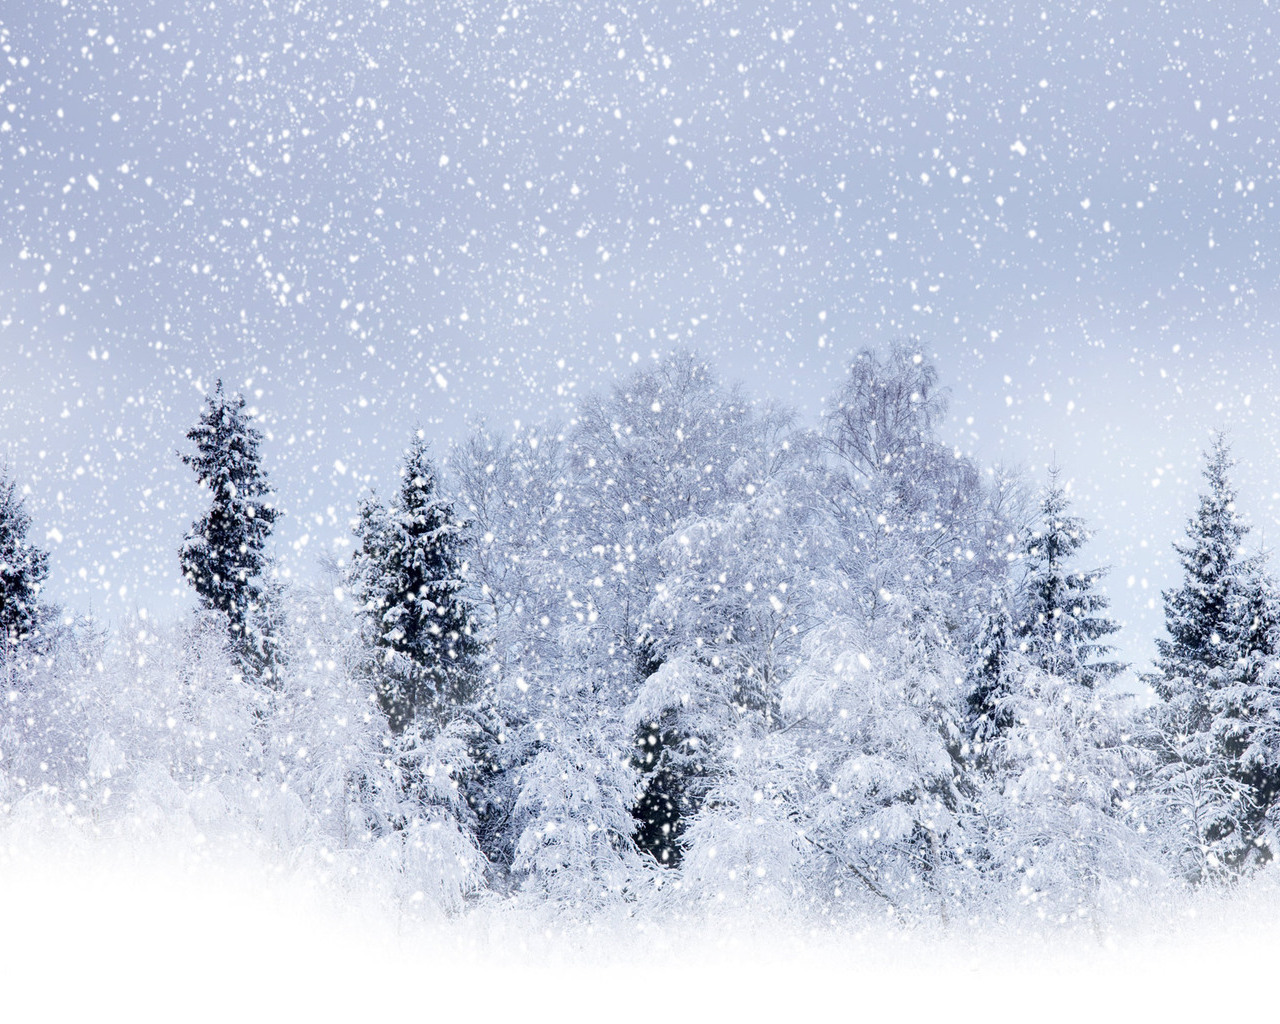 Beautiful Wallpapers Snowfall Wallpaper 1280x1024